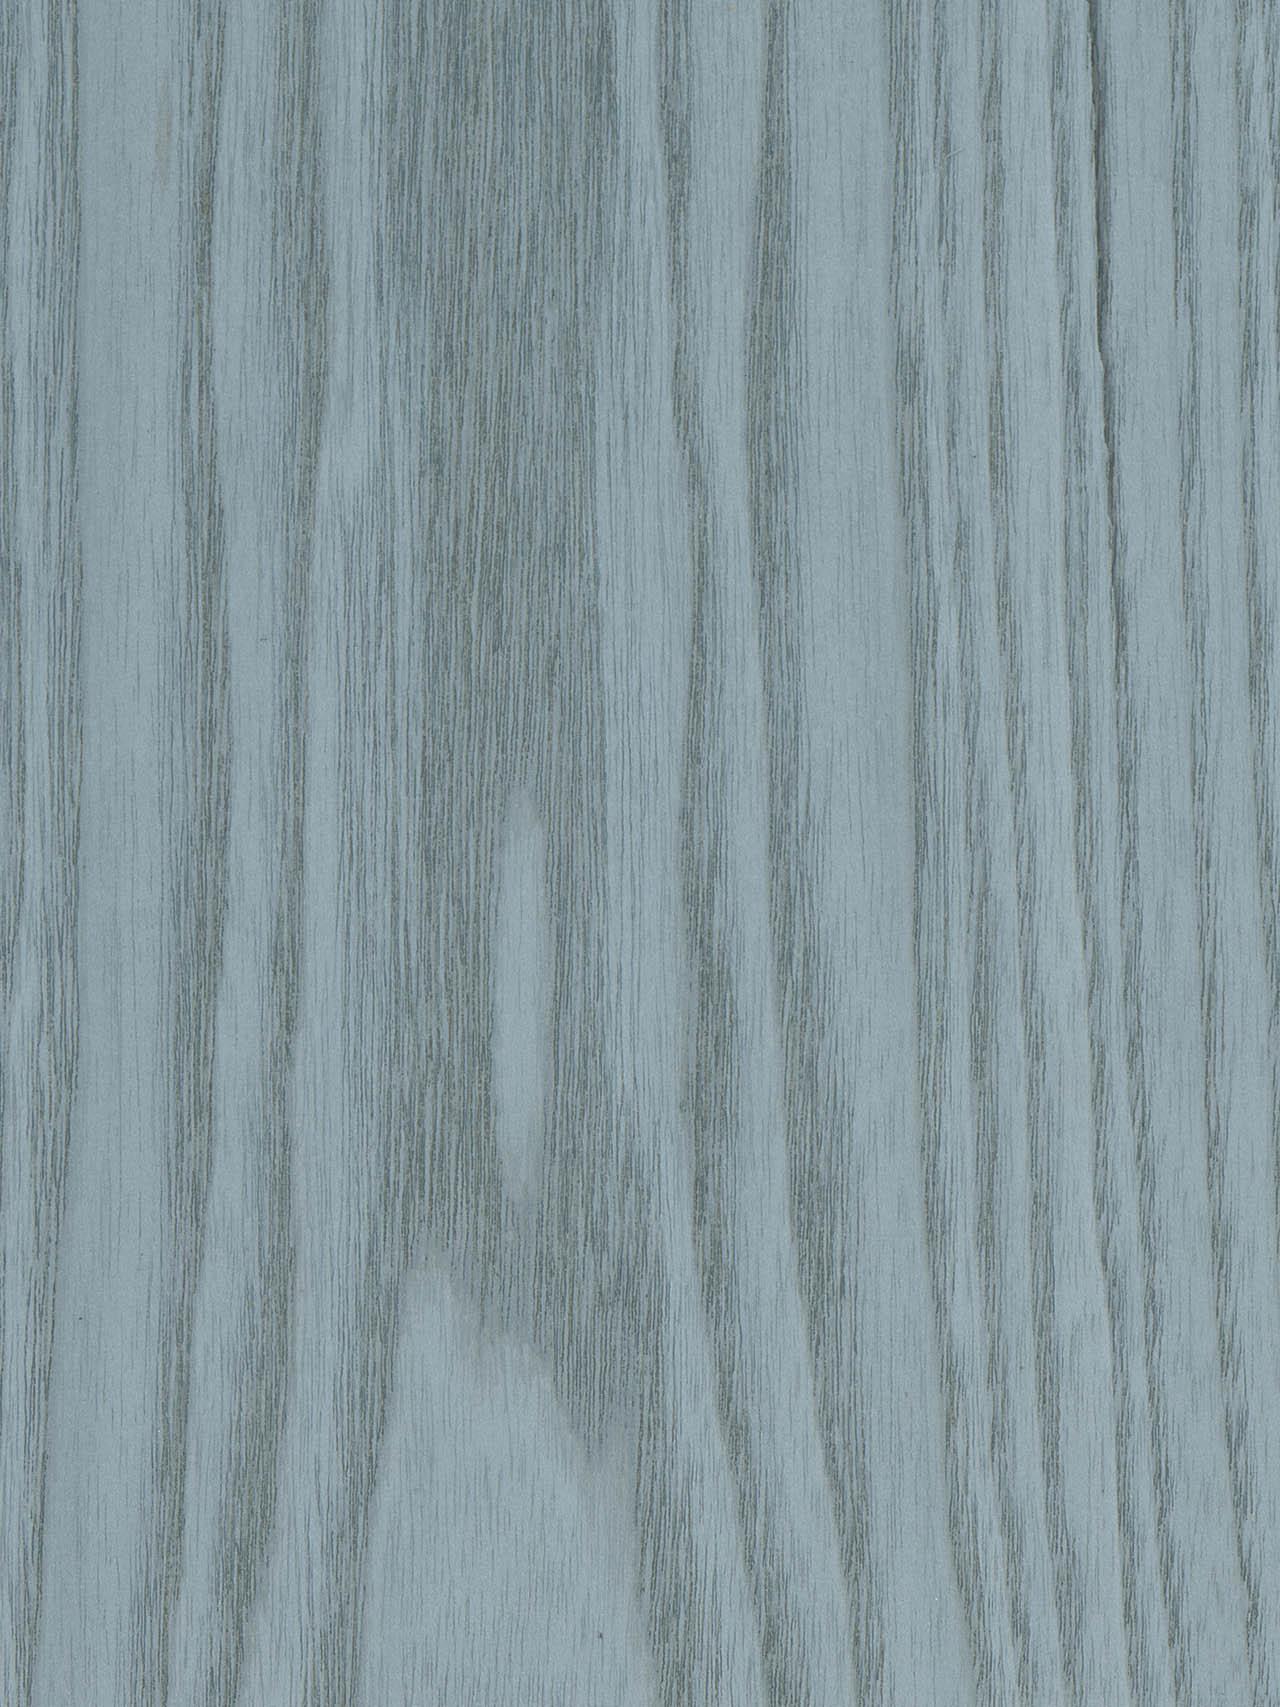 Chapa de madera Fresno Laguna ZBF100 Losán